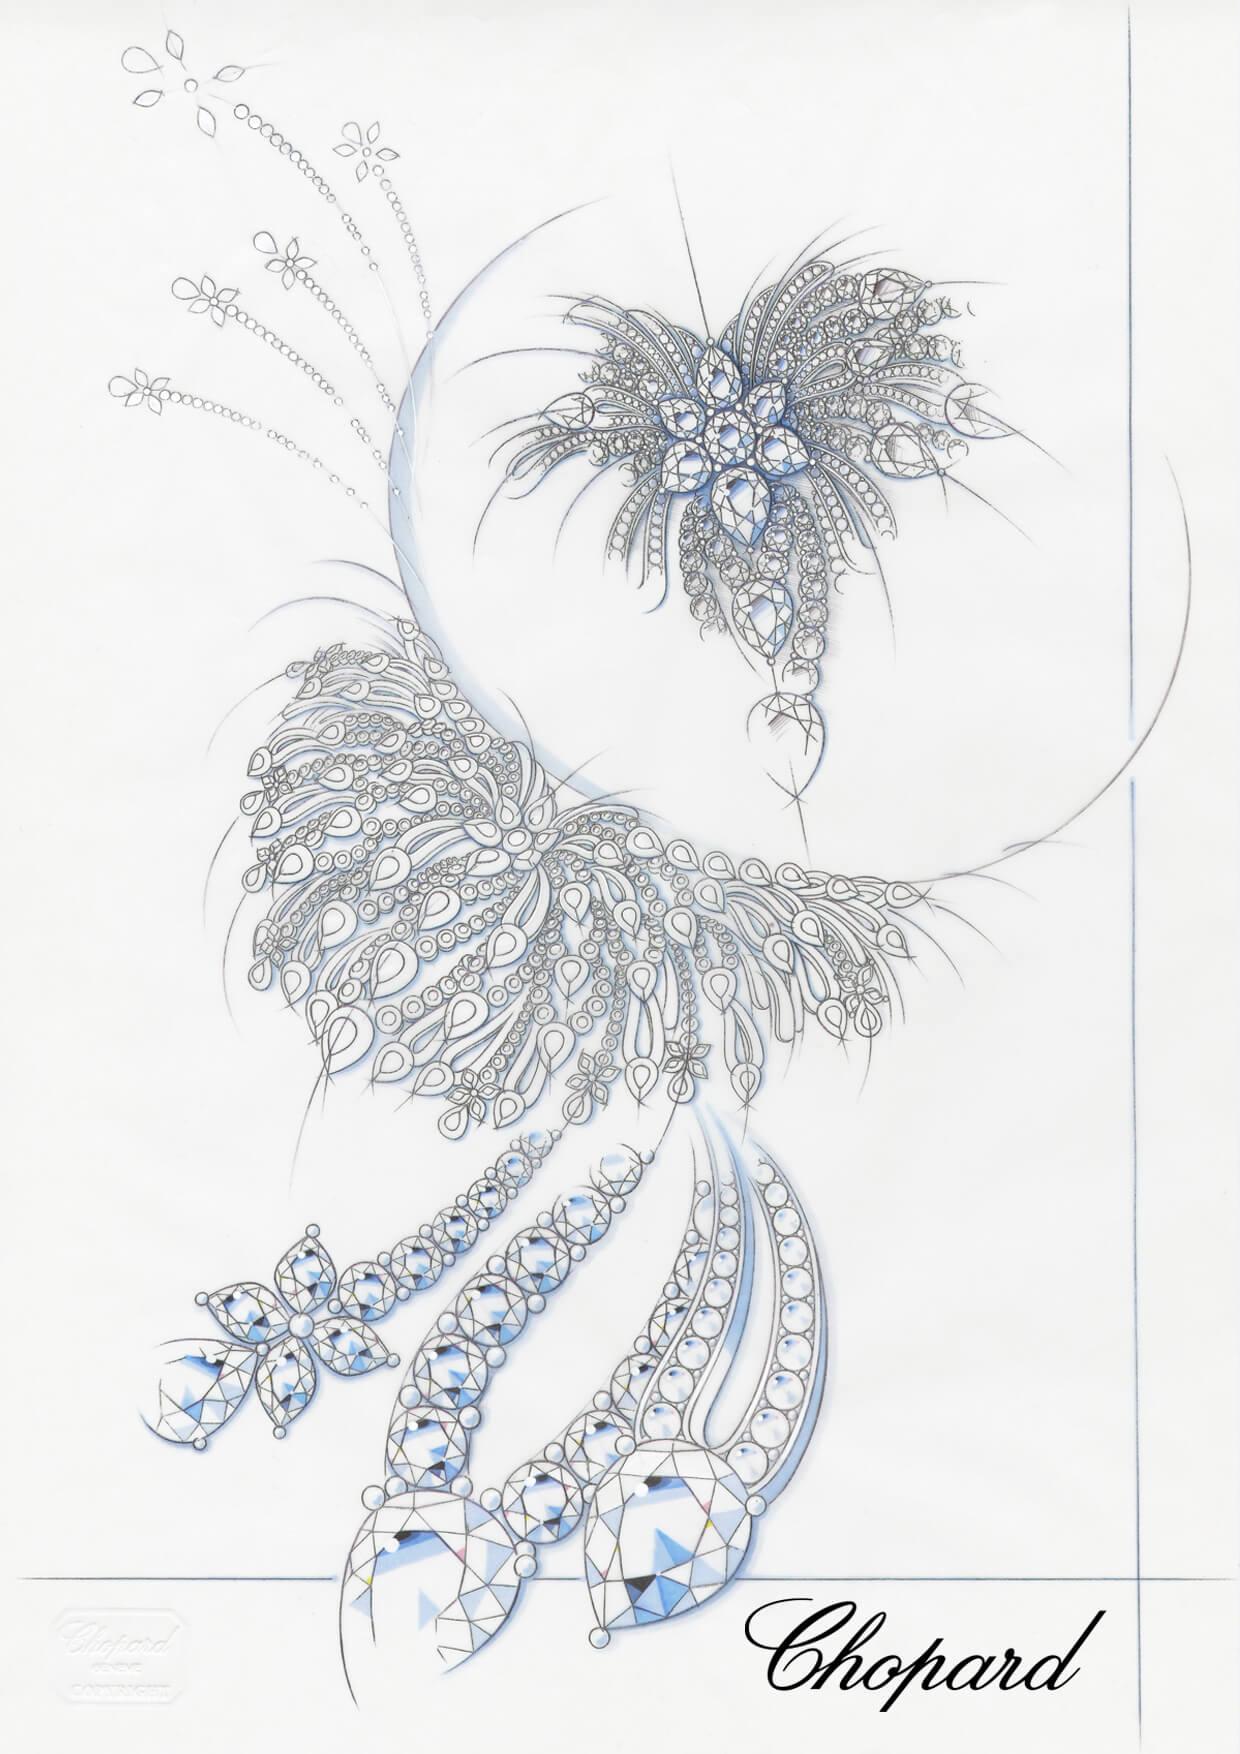 AltaJoyeria_Chopard_Sketch-Riviera-Set